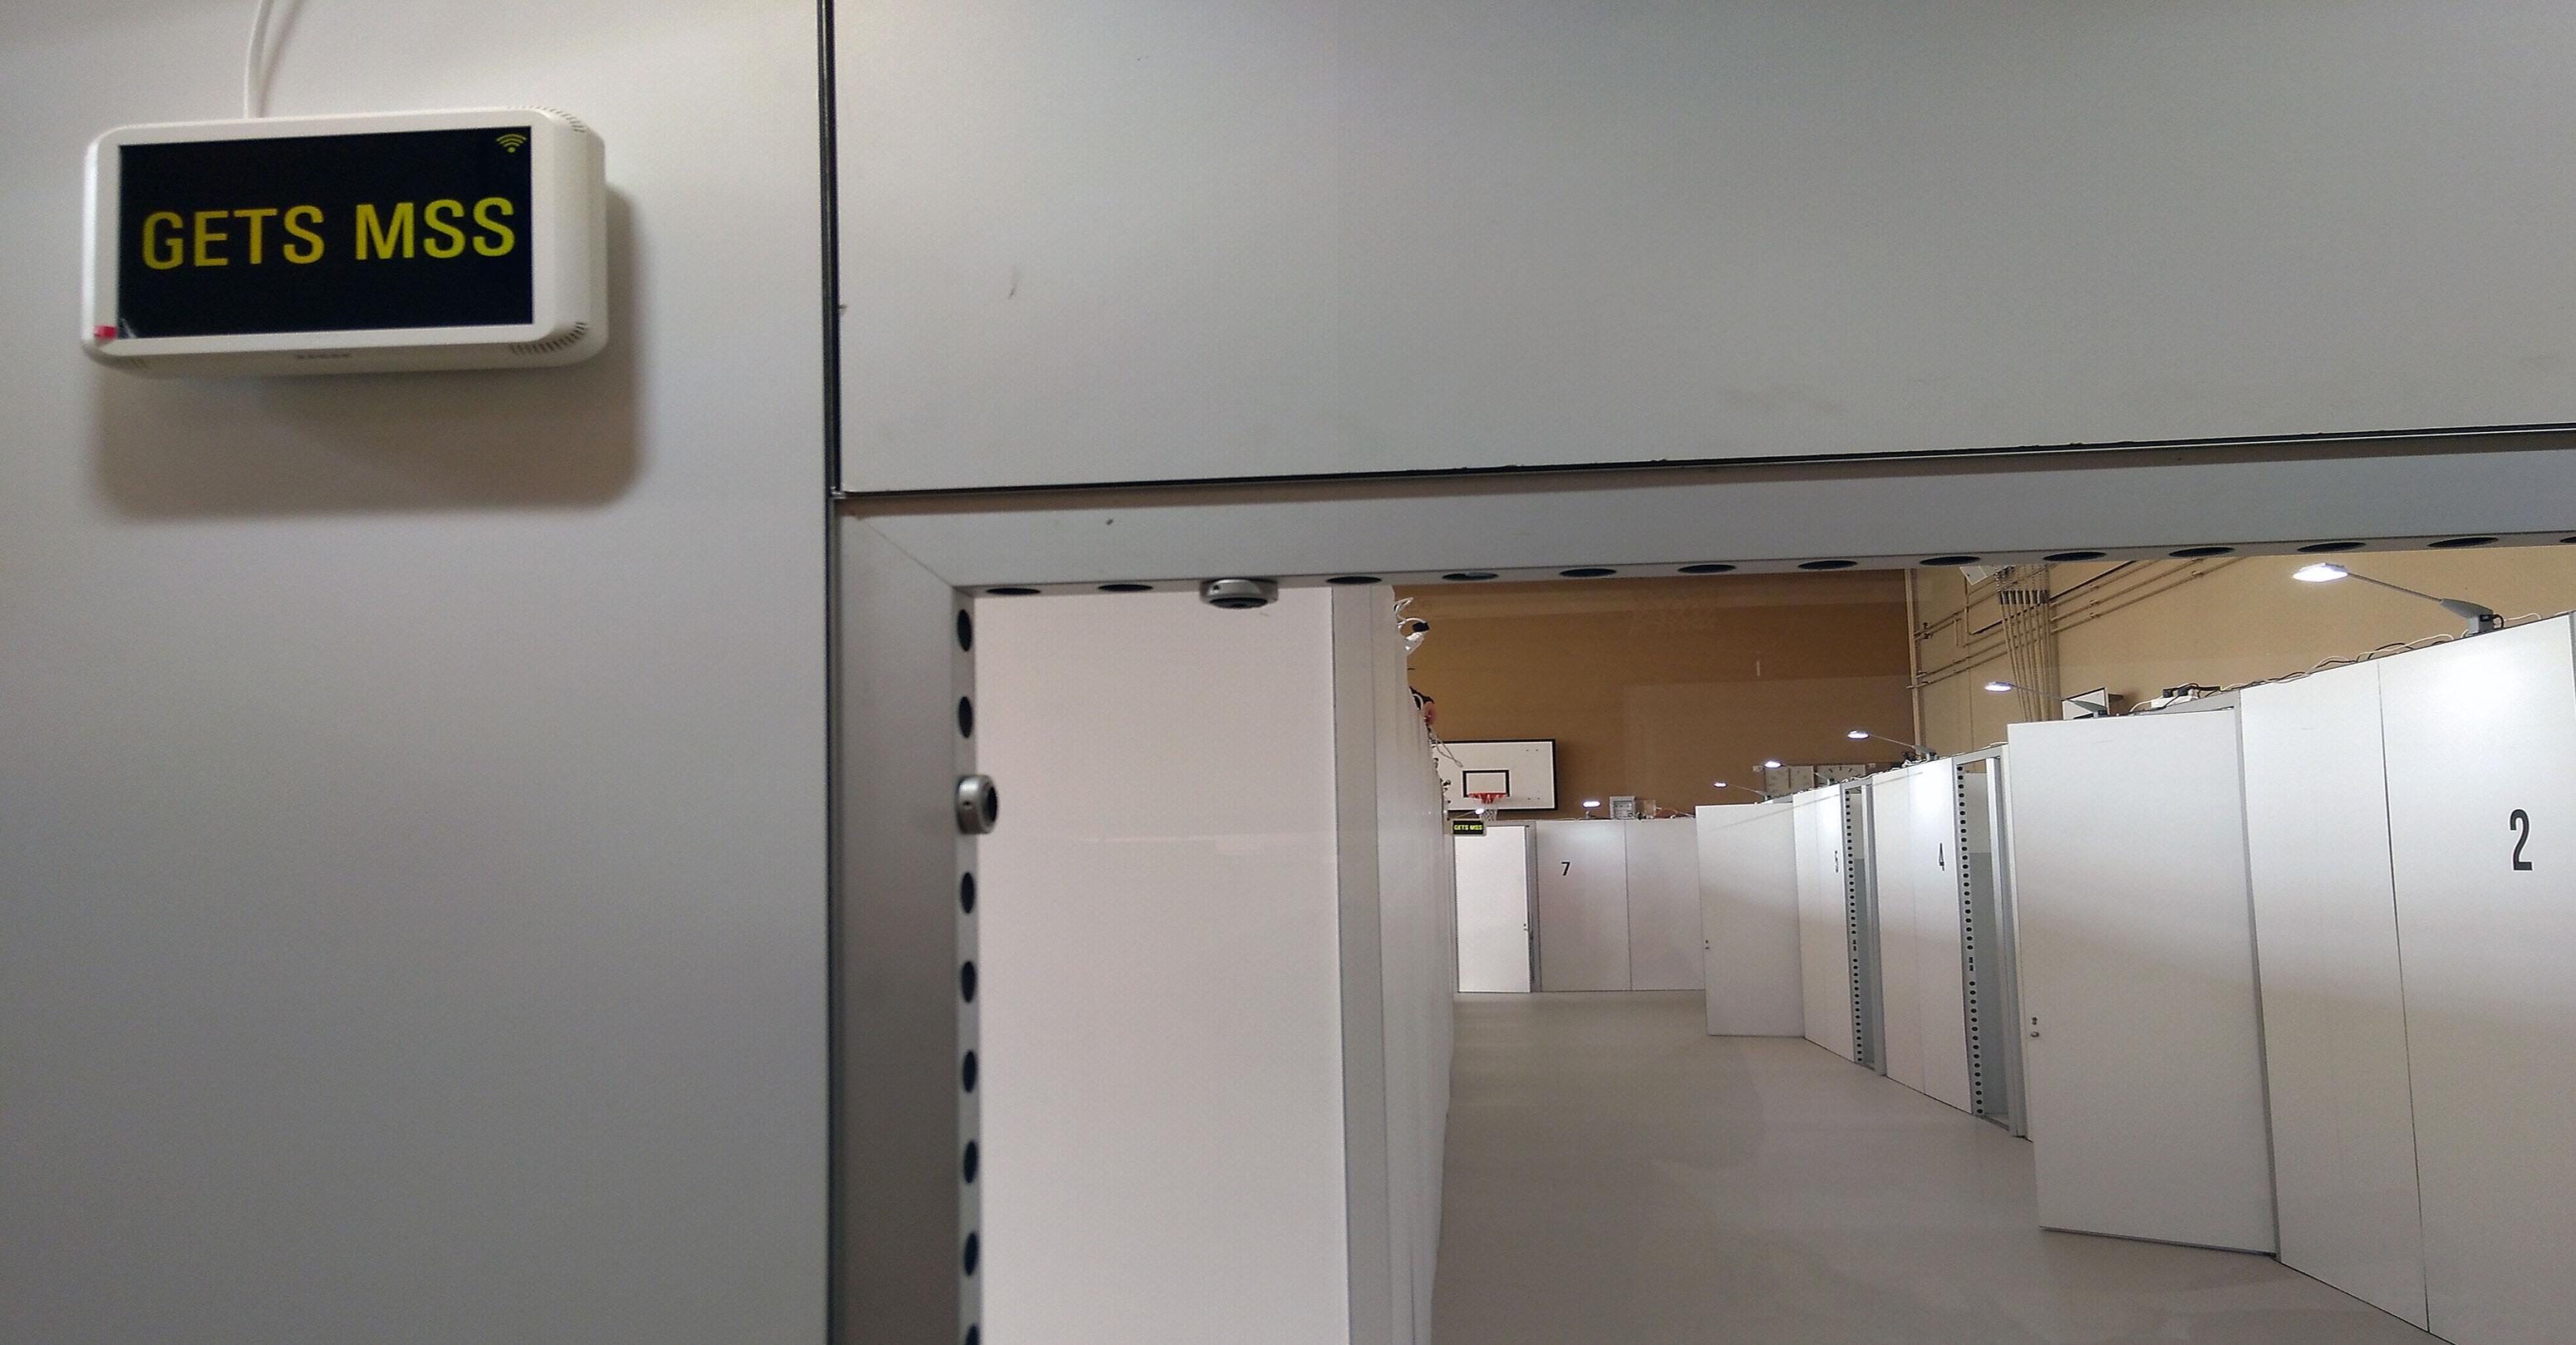 Zurich University Hospital Converts Sports Facilities Into Treatment Unit